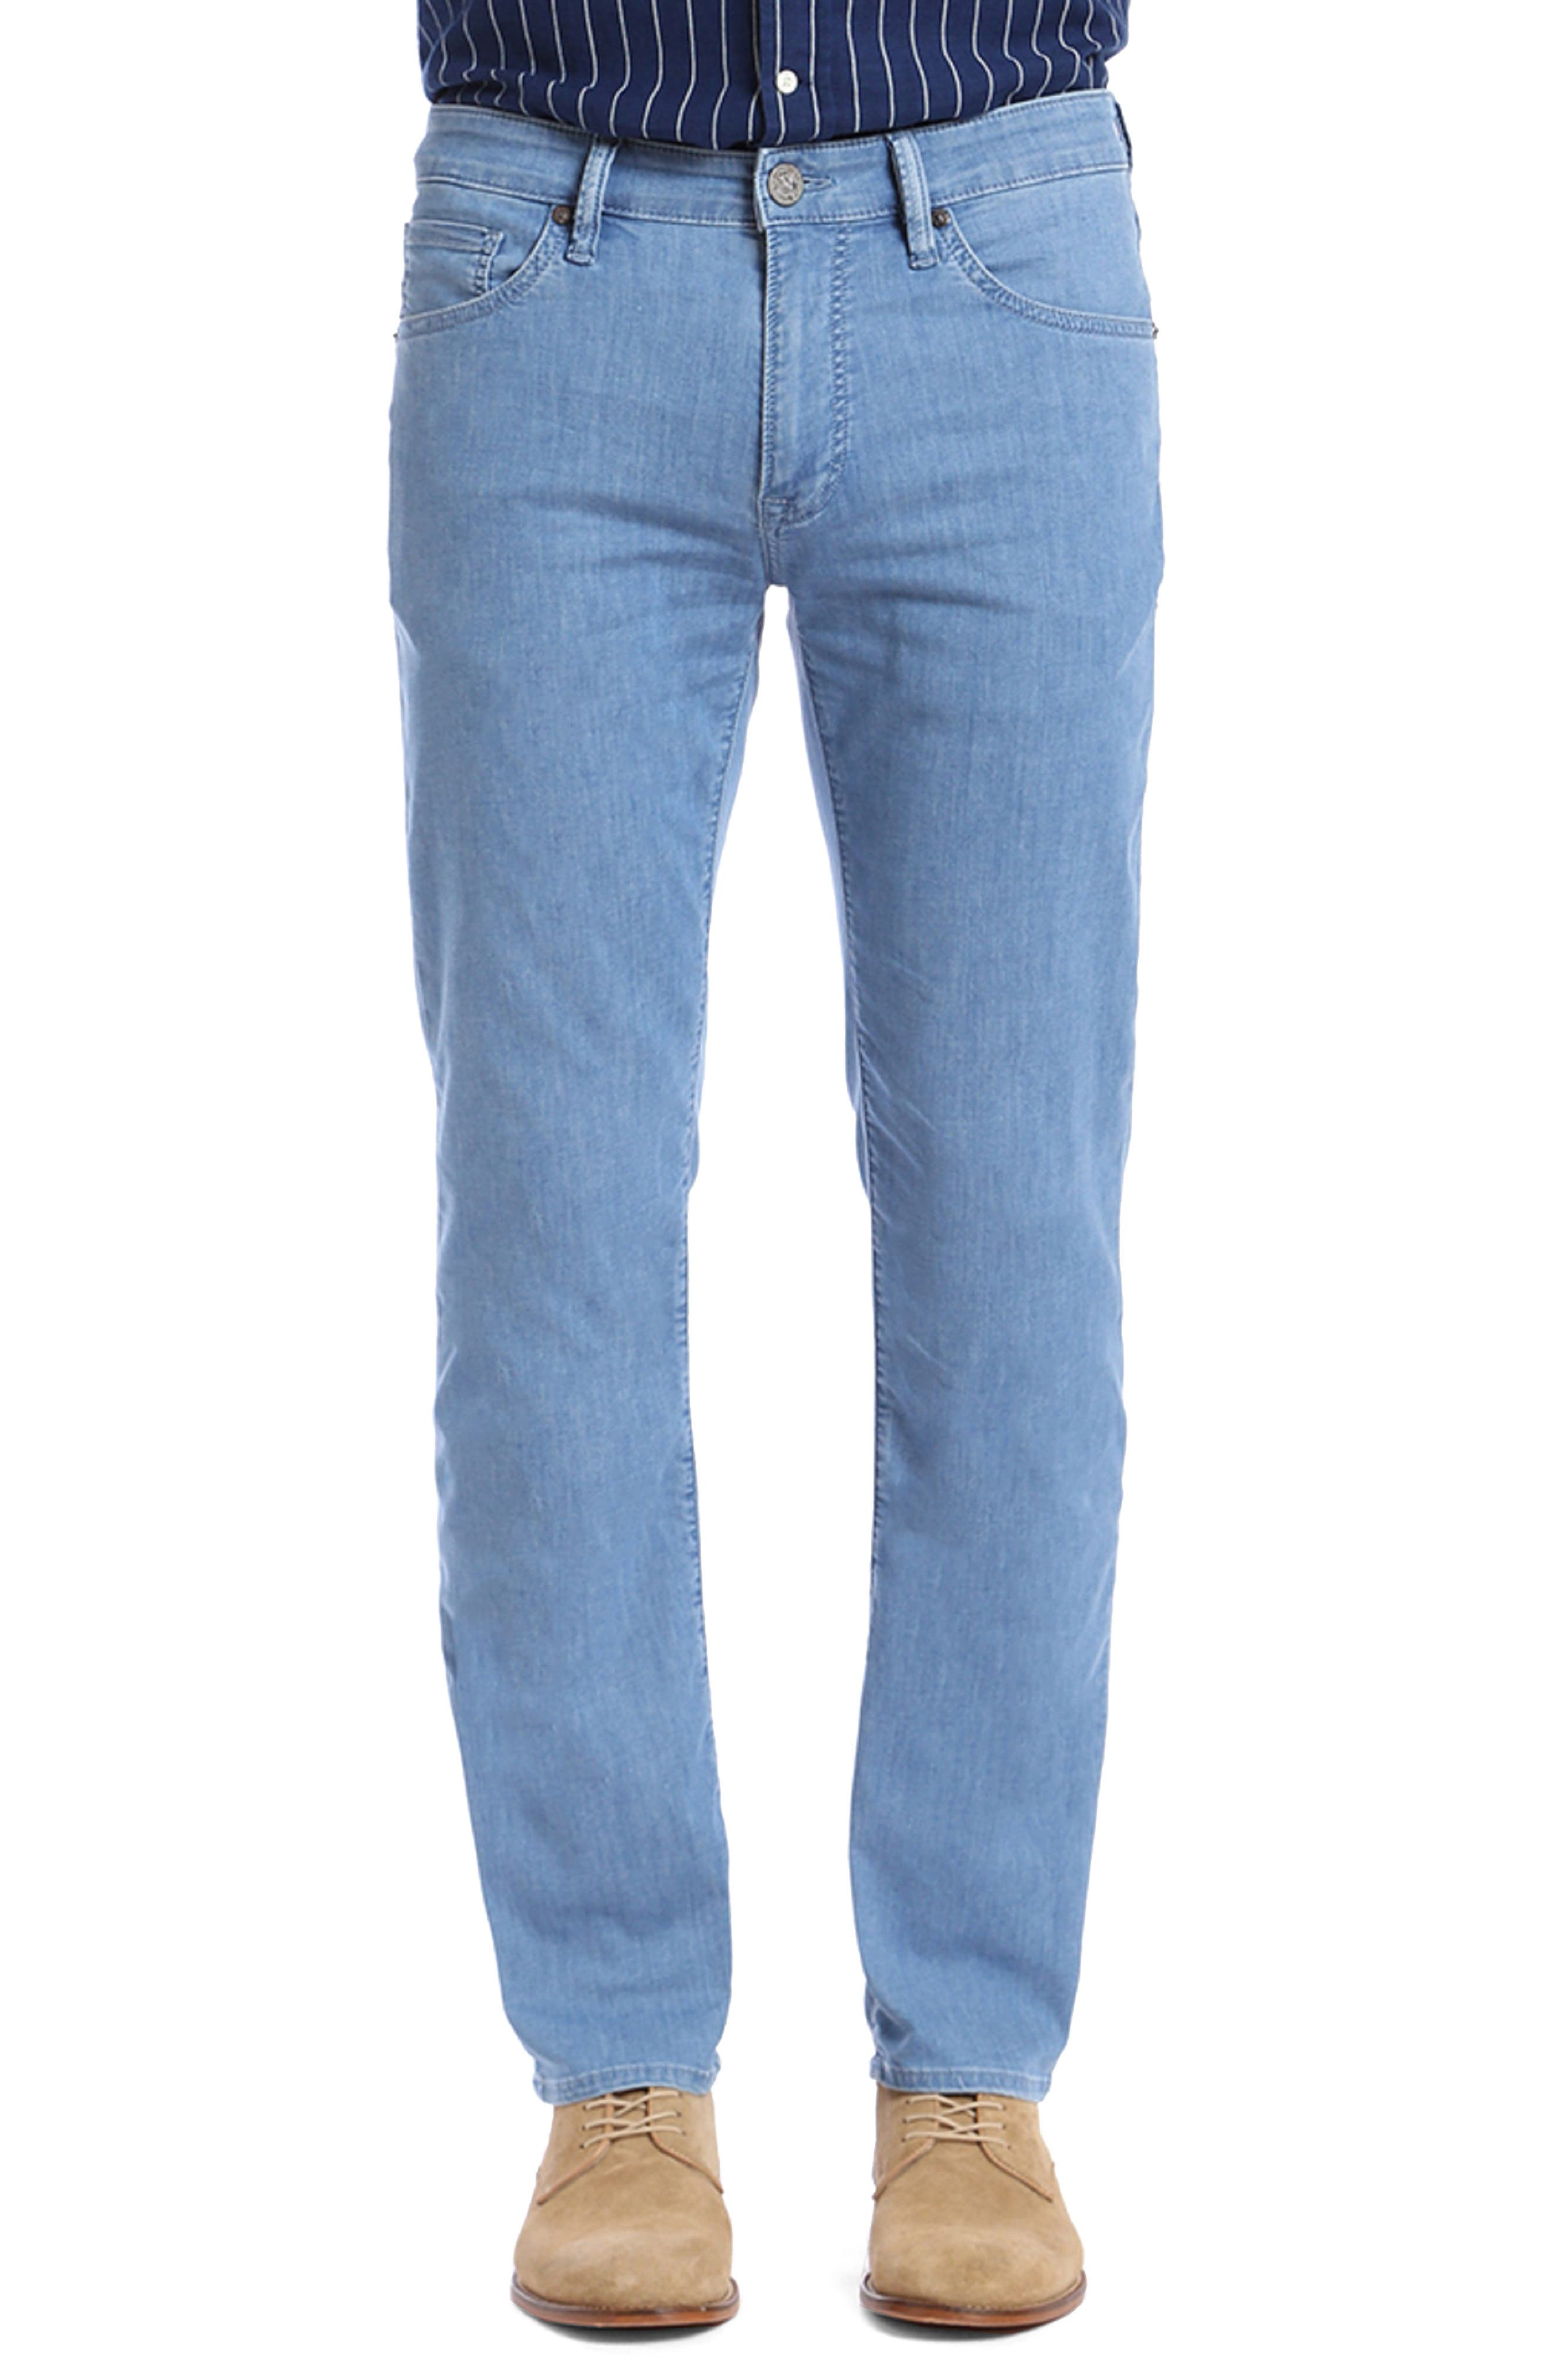 Charisma Relaxed Fit Jeans,                             Main thumbnail 1, color,                             Light Maui Denim